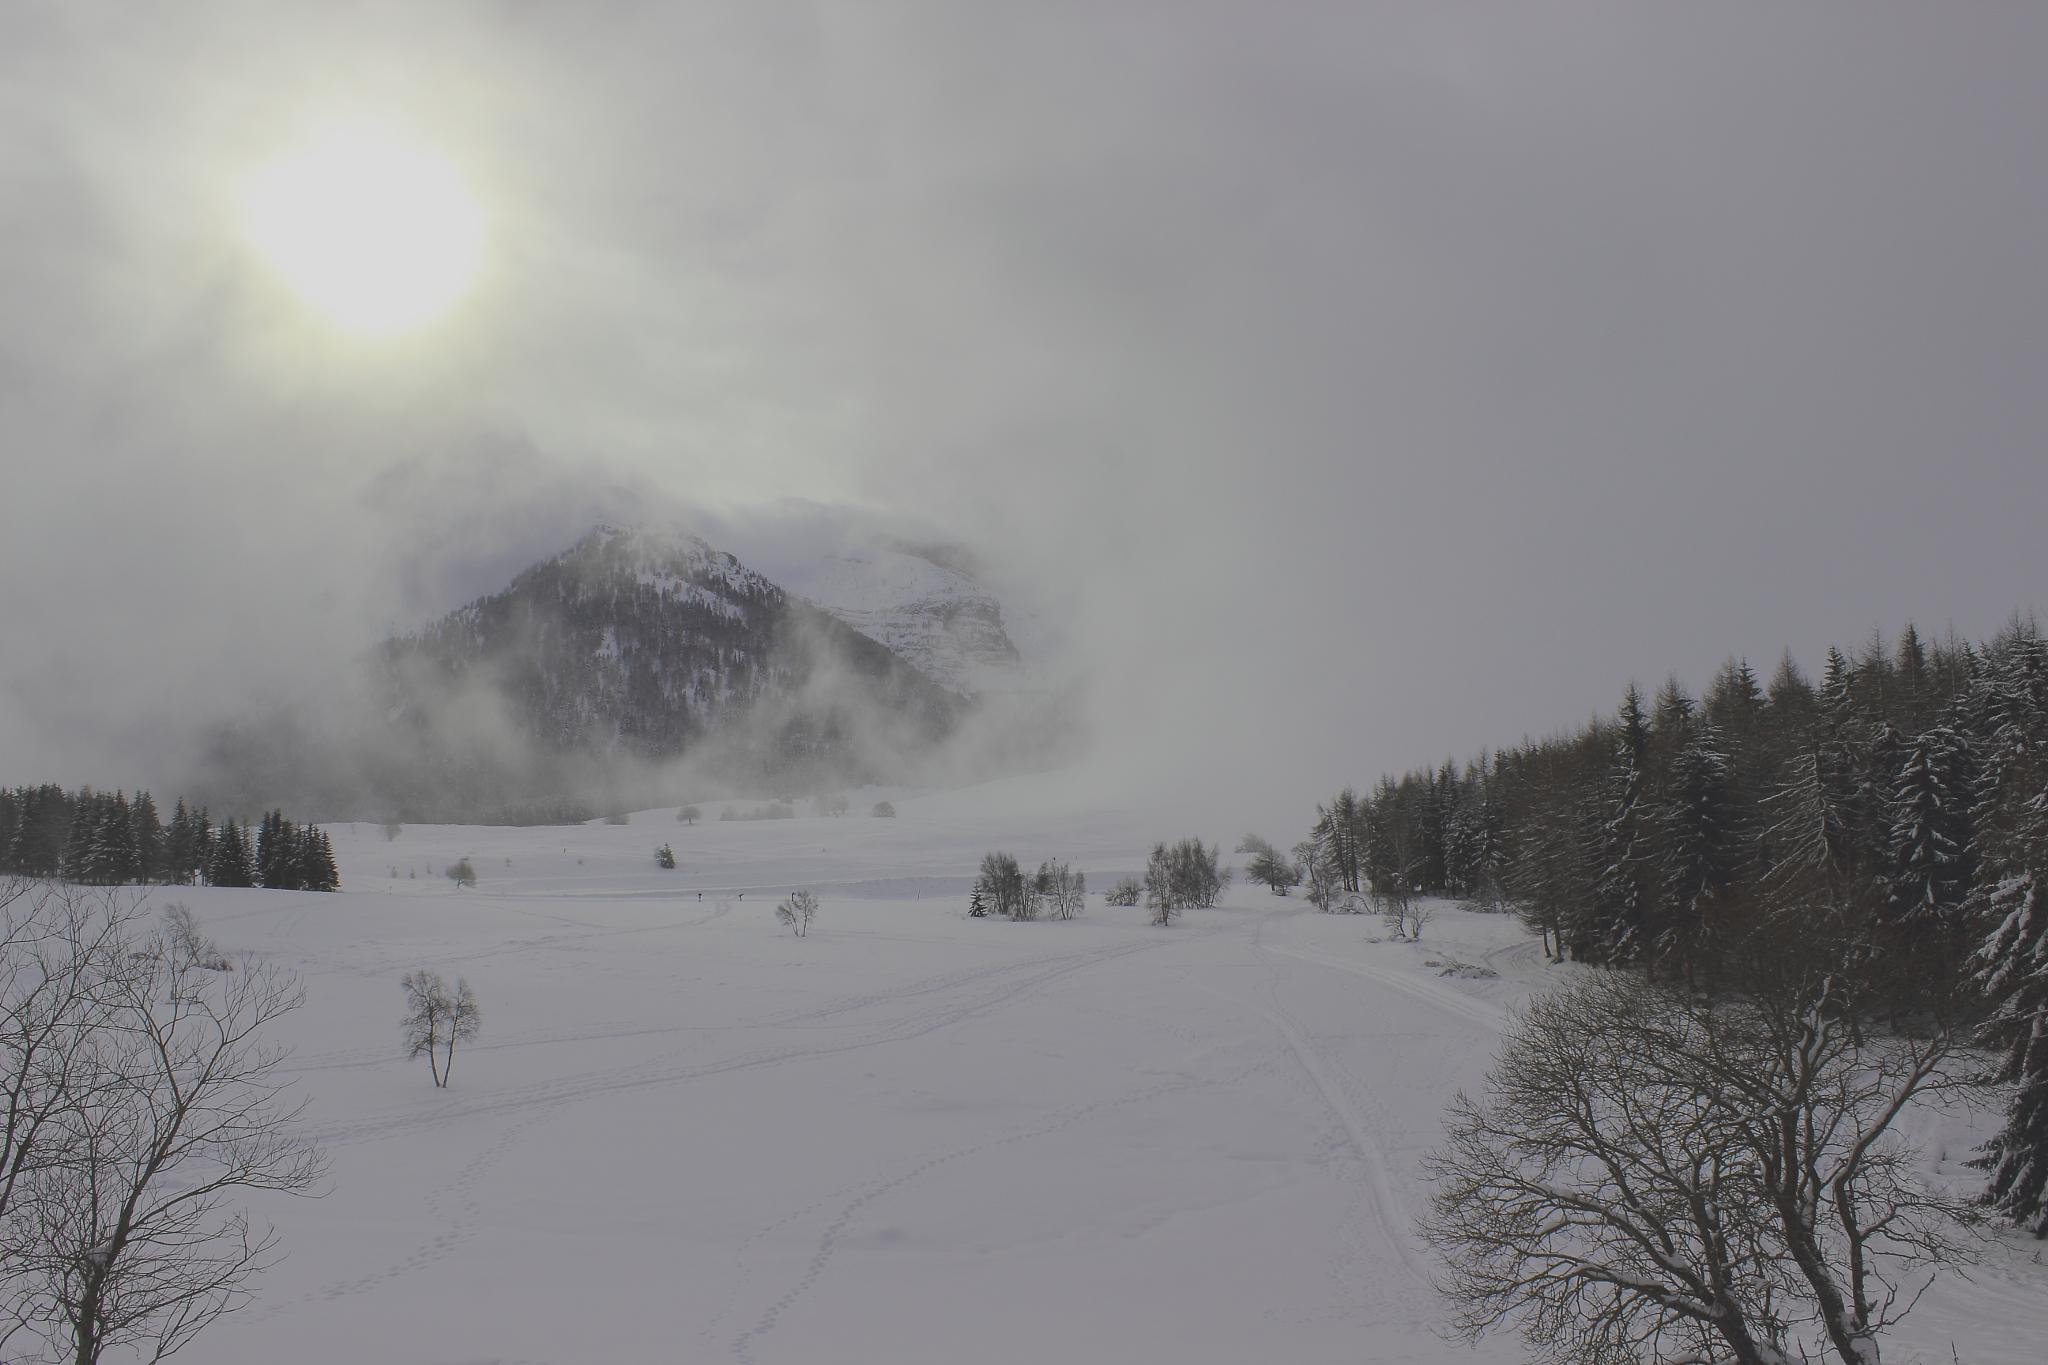 Fog on mountain by Lorenzo.Bruscaggin